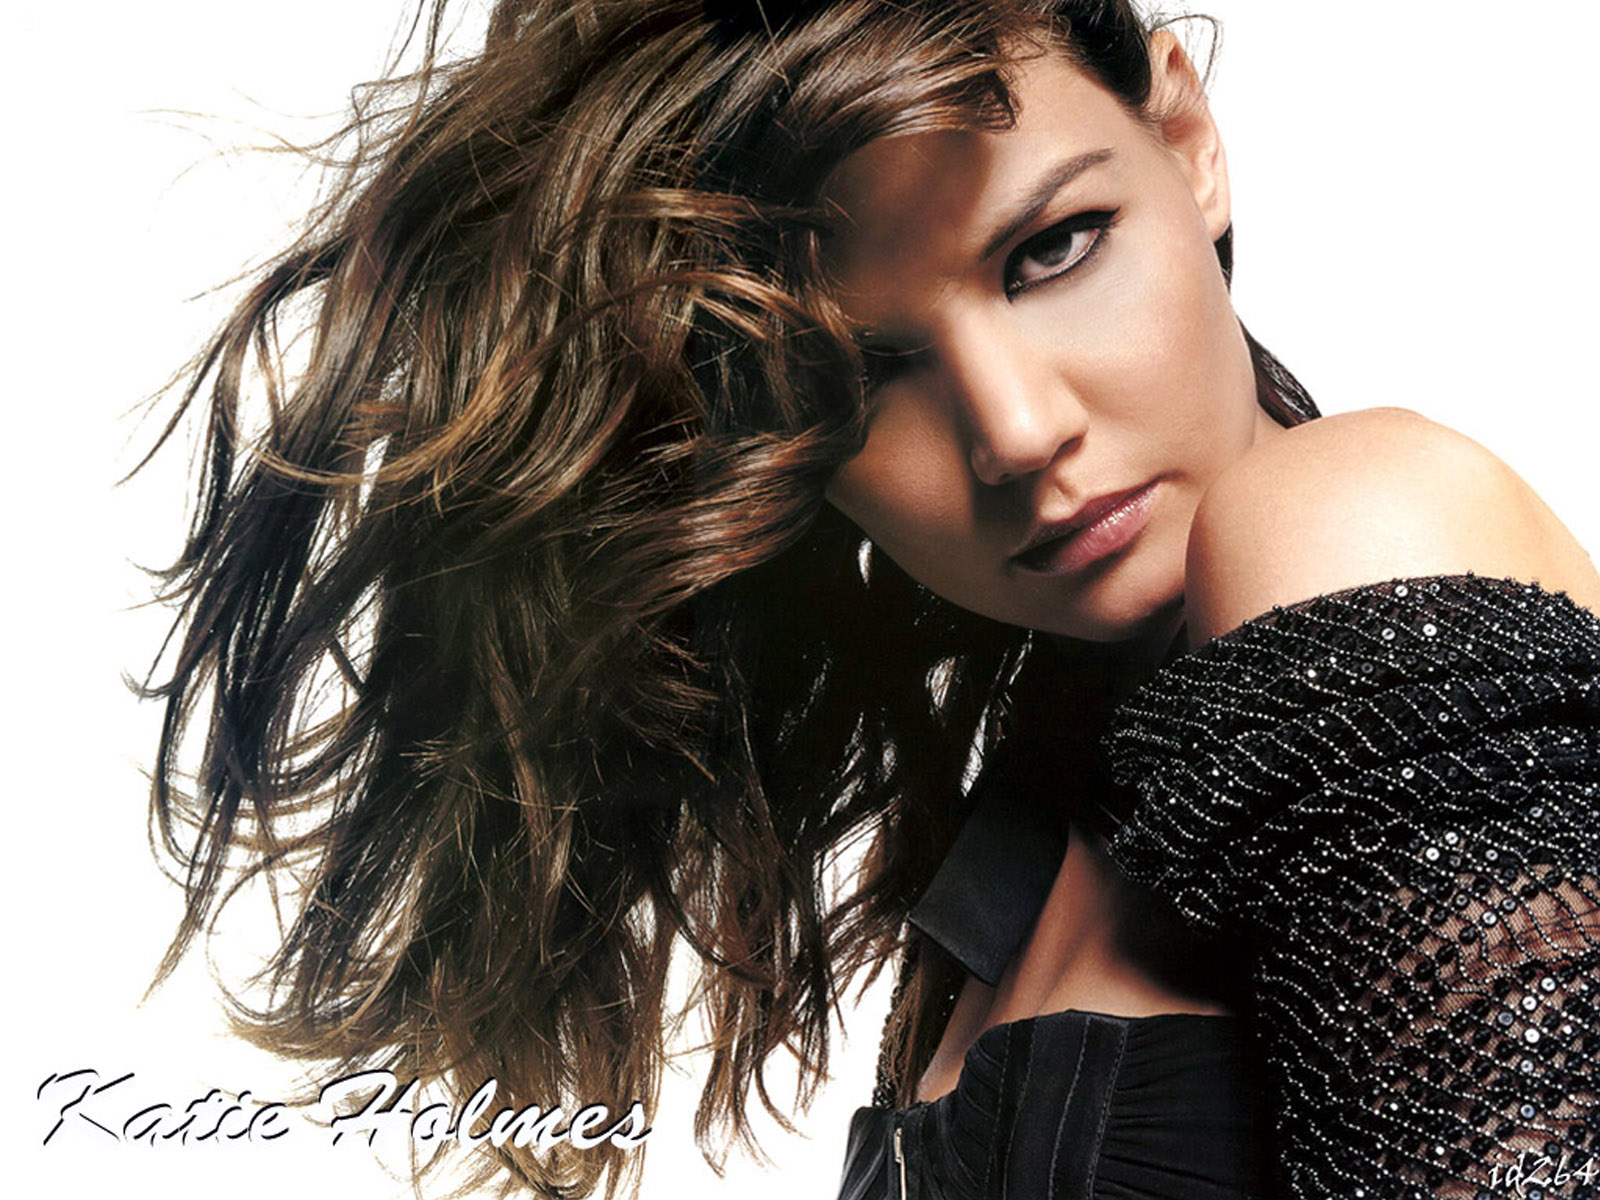 http://images.fanpop.com/images/image_uploads/Katie-katie-holmes-135632_1600_1200.jpg